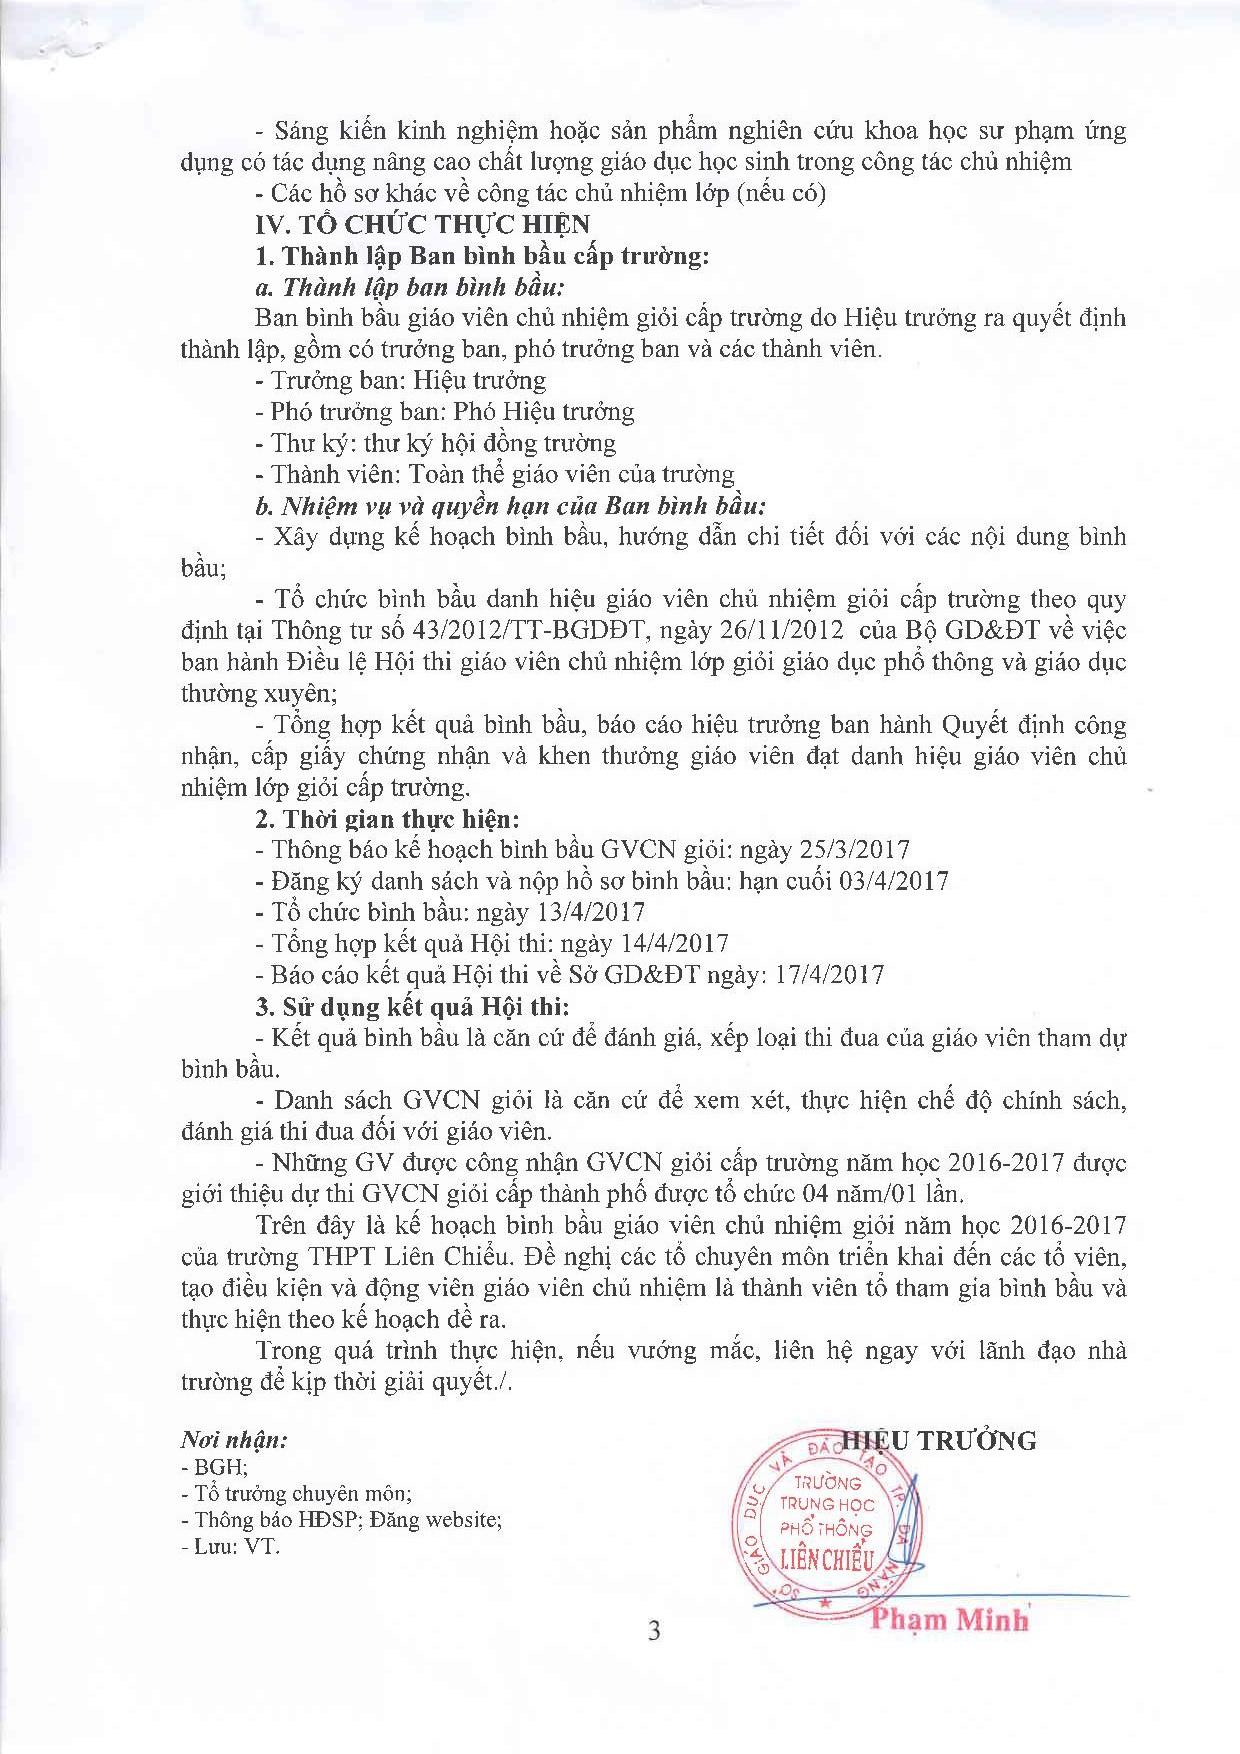 KE HOACH TO CHUC BINH BAU GVCN GIOI CAP TRUONG NAM HOC 2016-2017-page-003